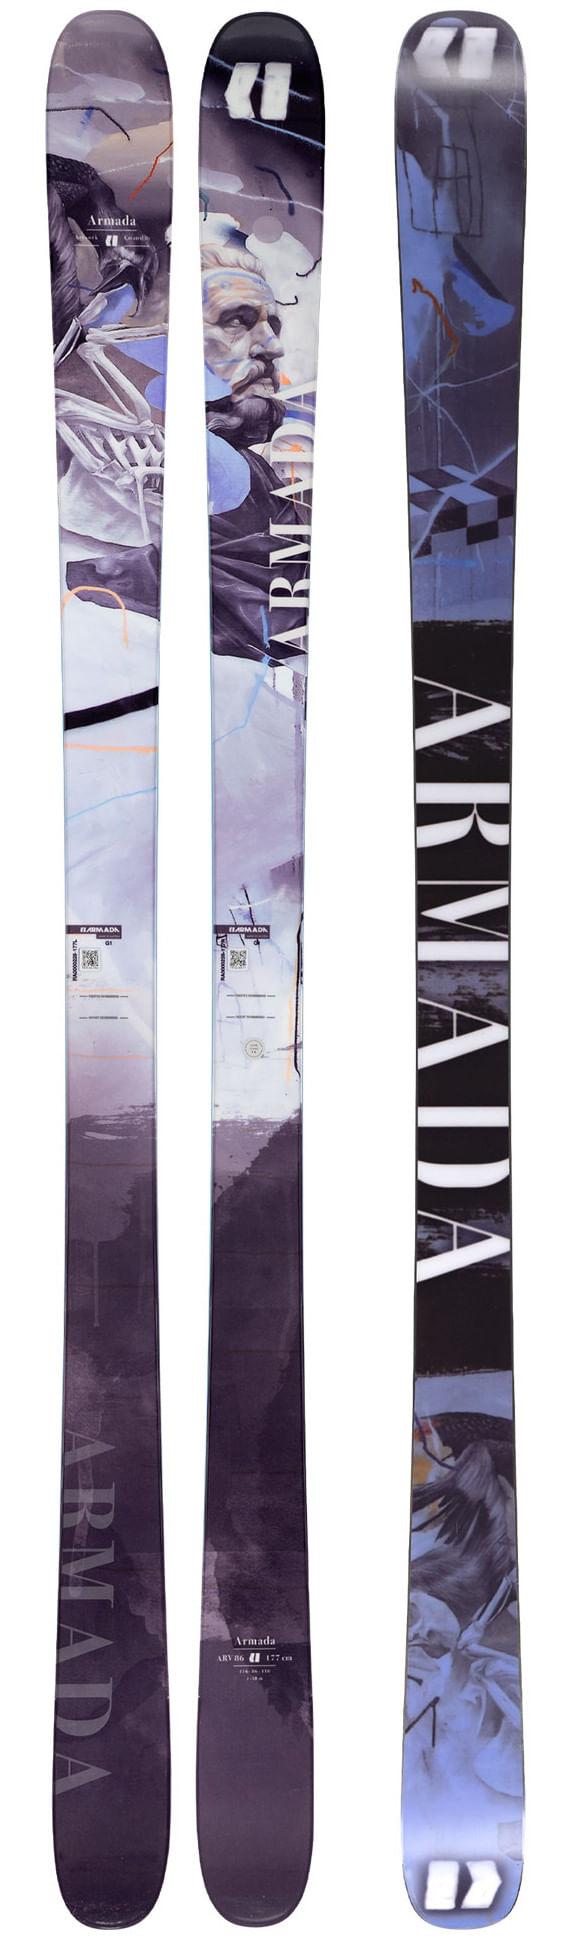 Armada-ARV-86-Skis-2021